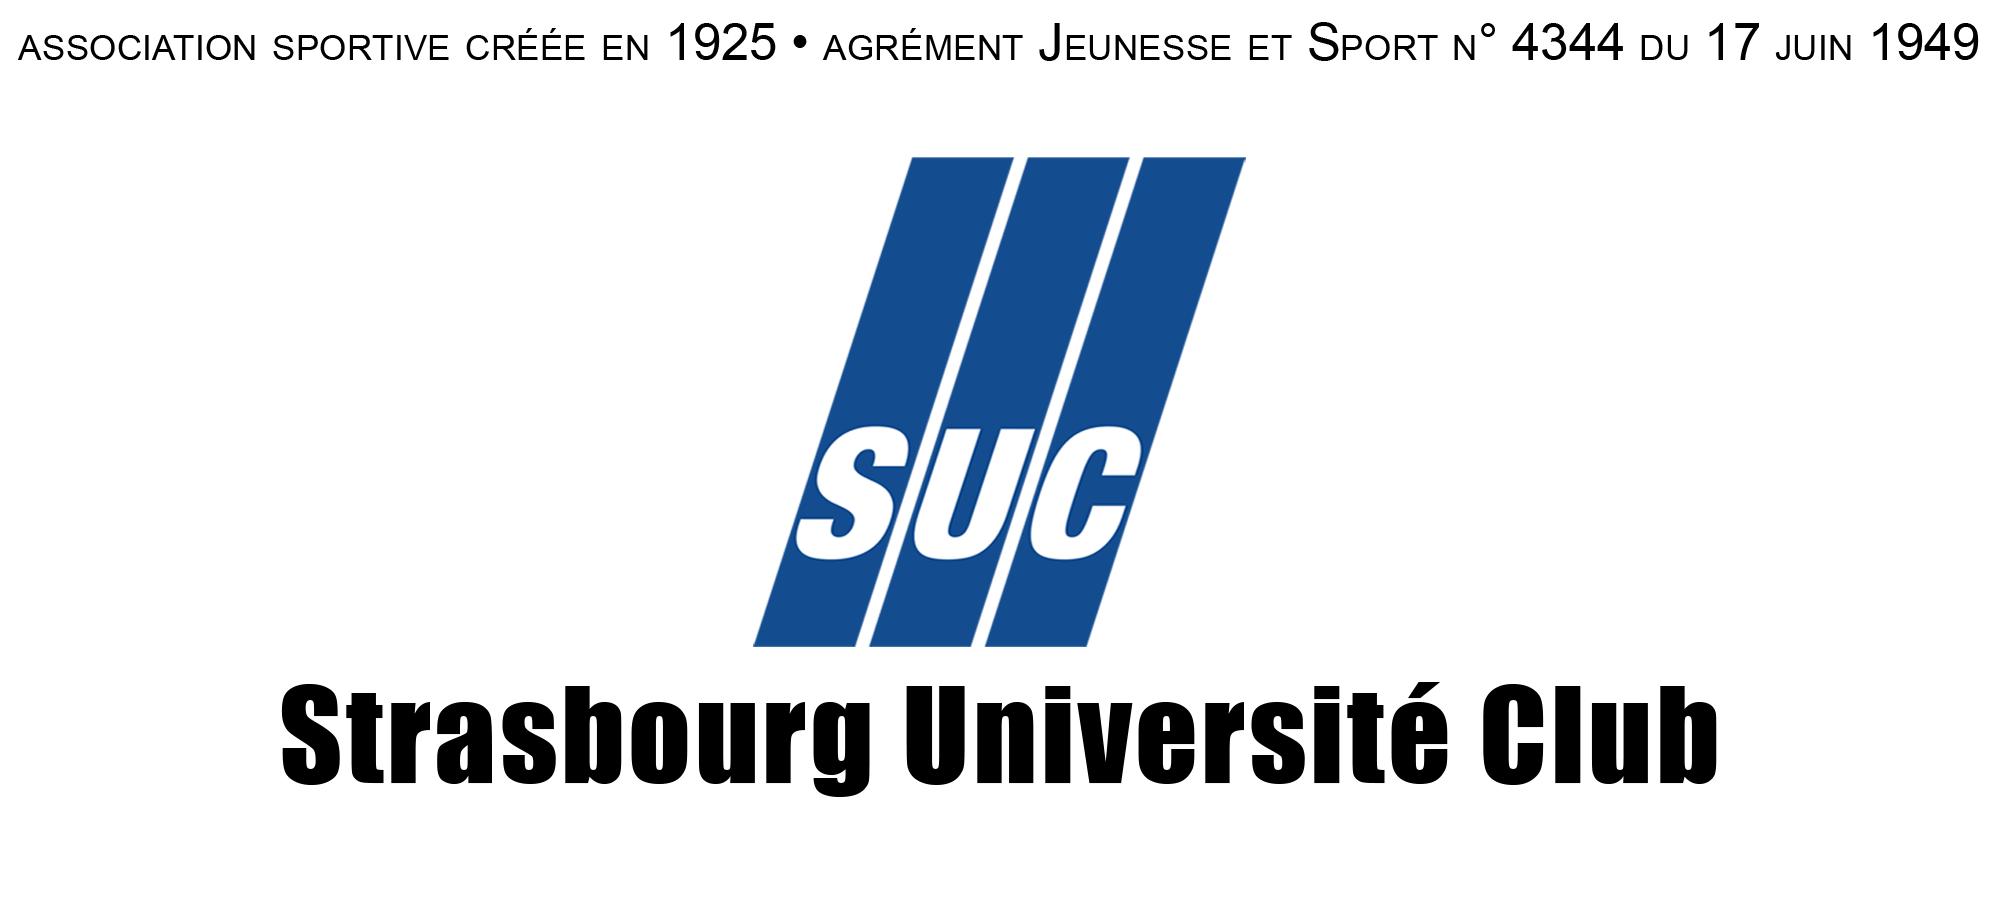 Strasbourg Université Club